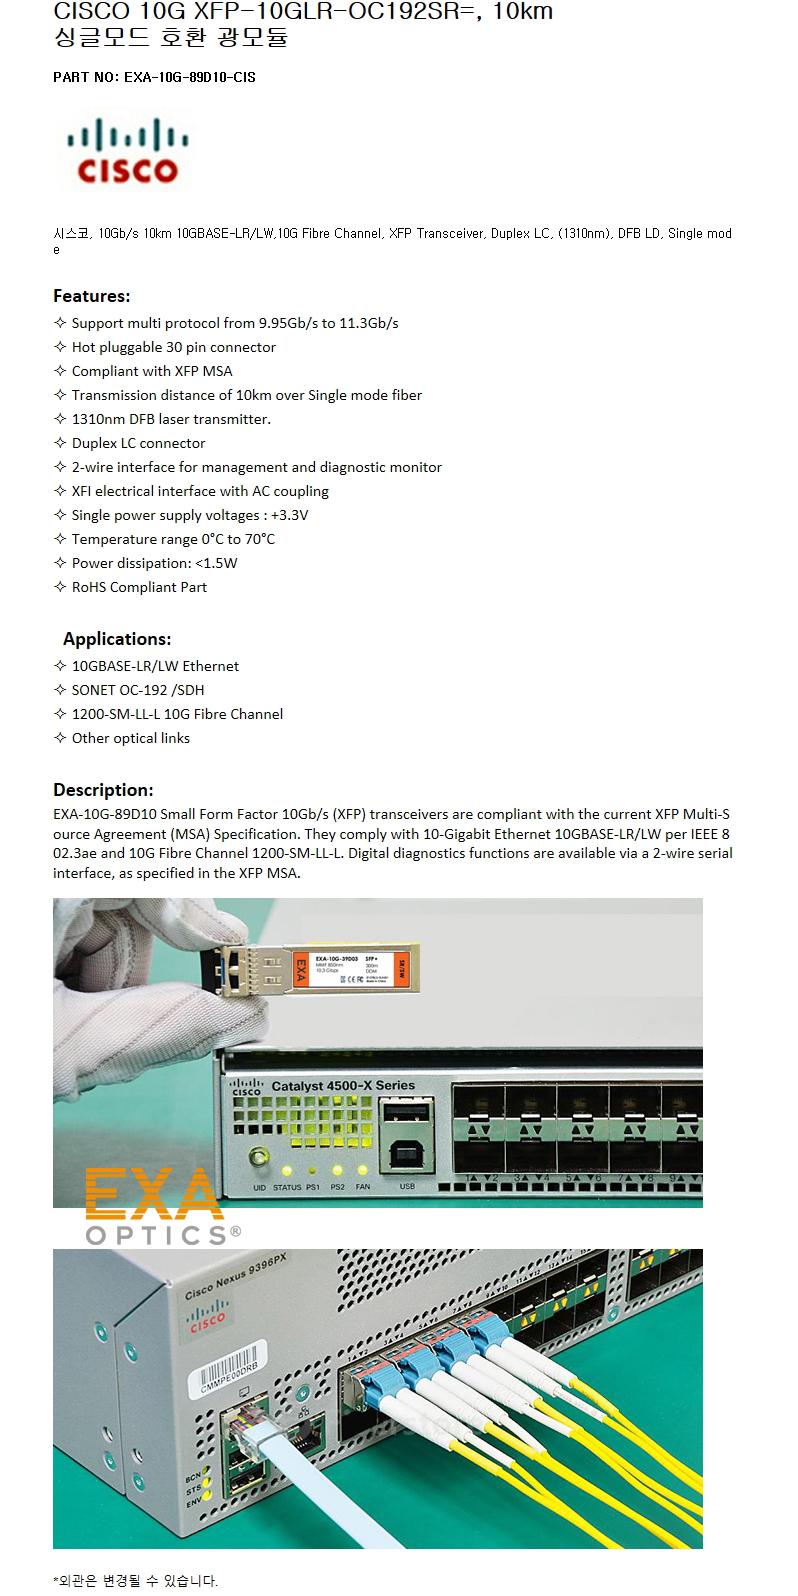 CISCO XFP-10GLR-OC192SR= 10km Compatible Transceiver